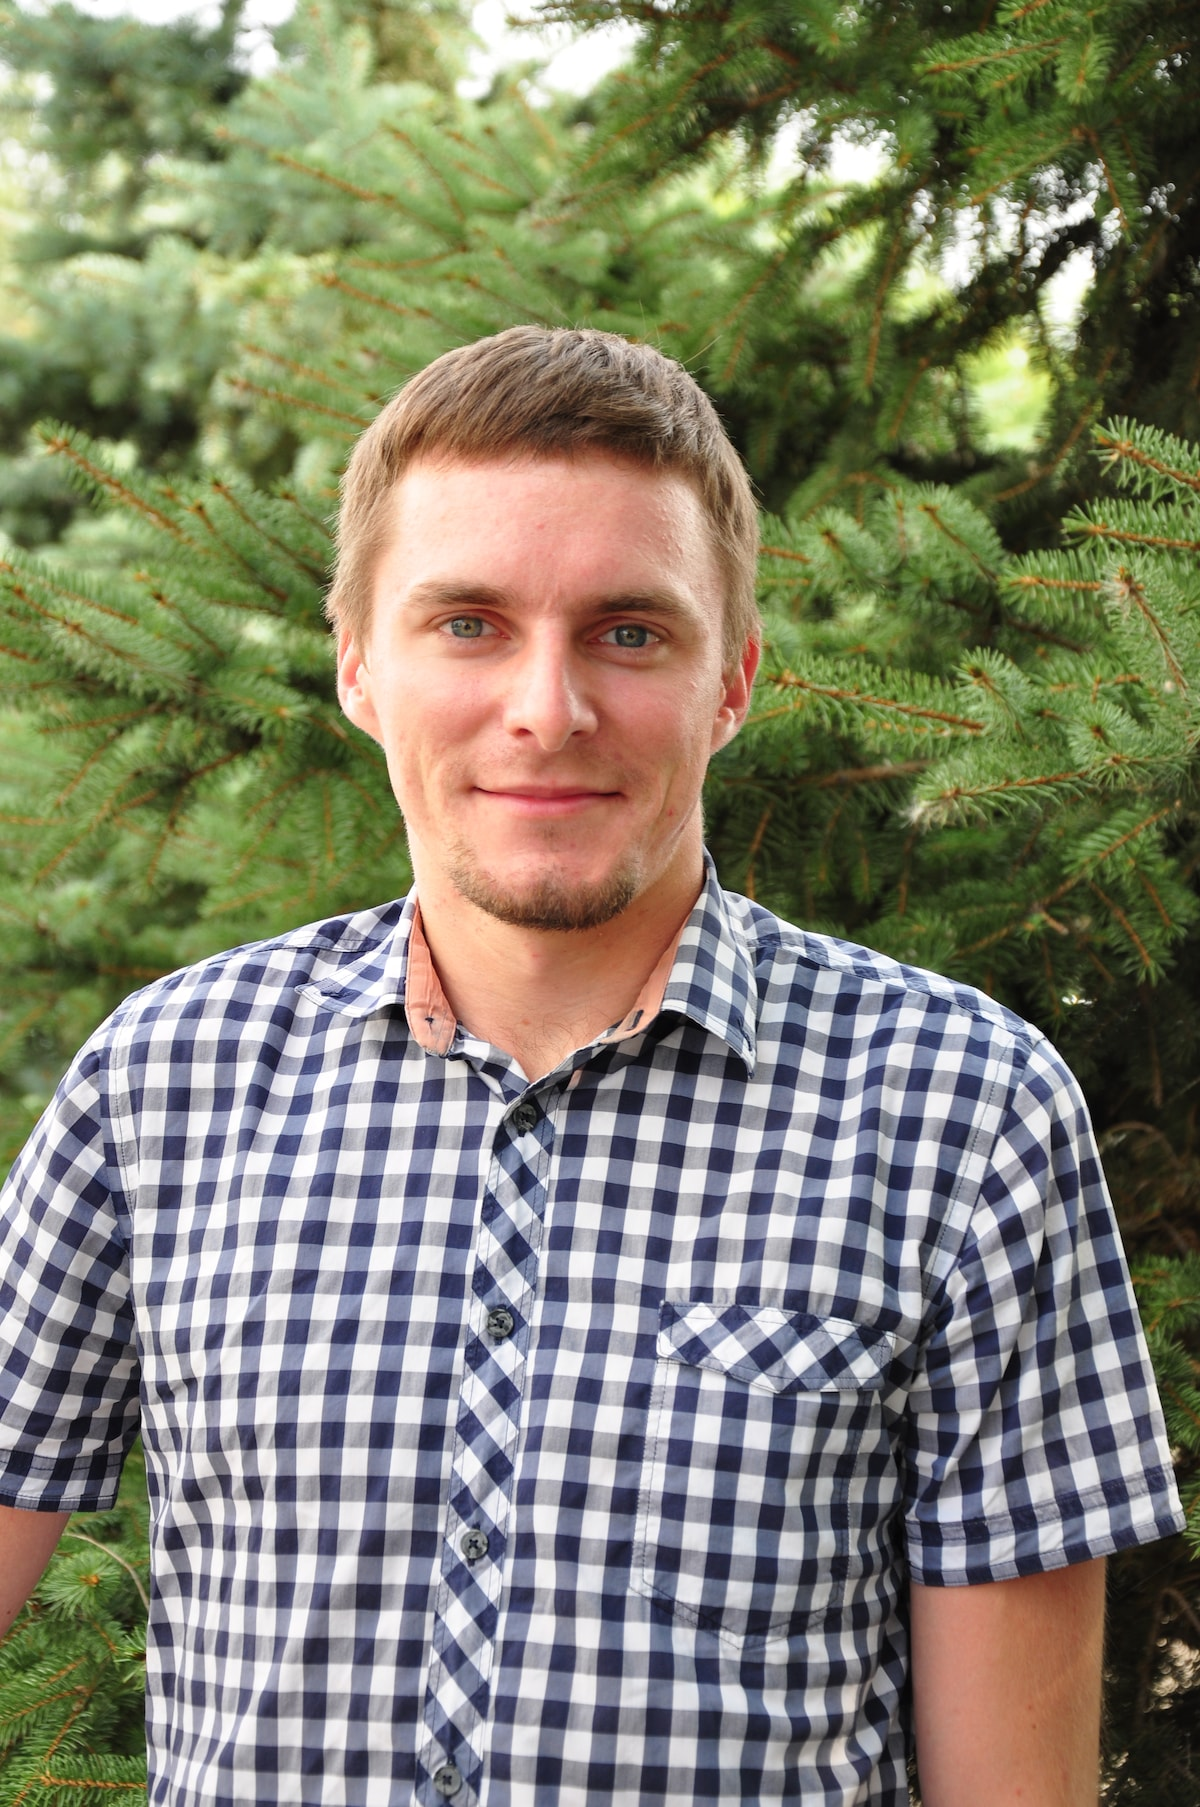 Viacheslav from Volgograd